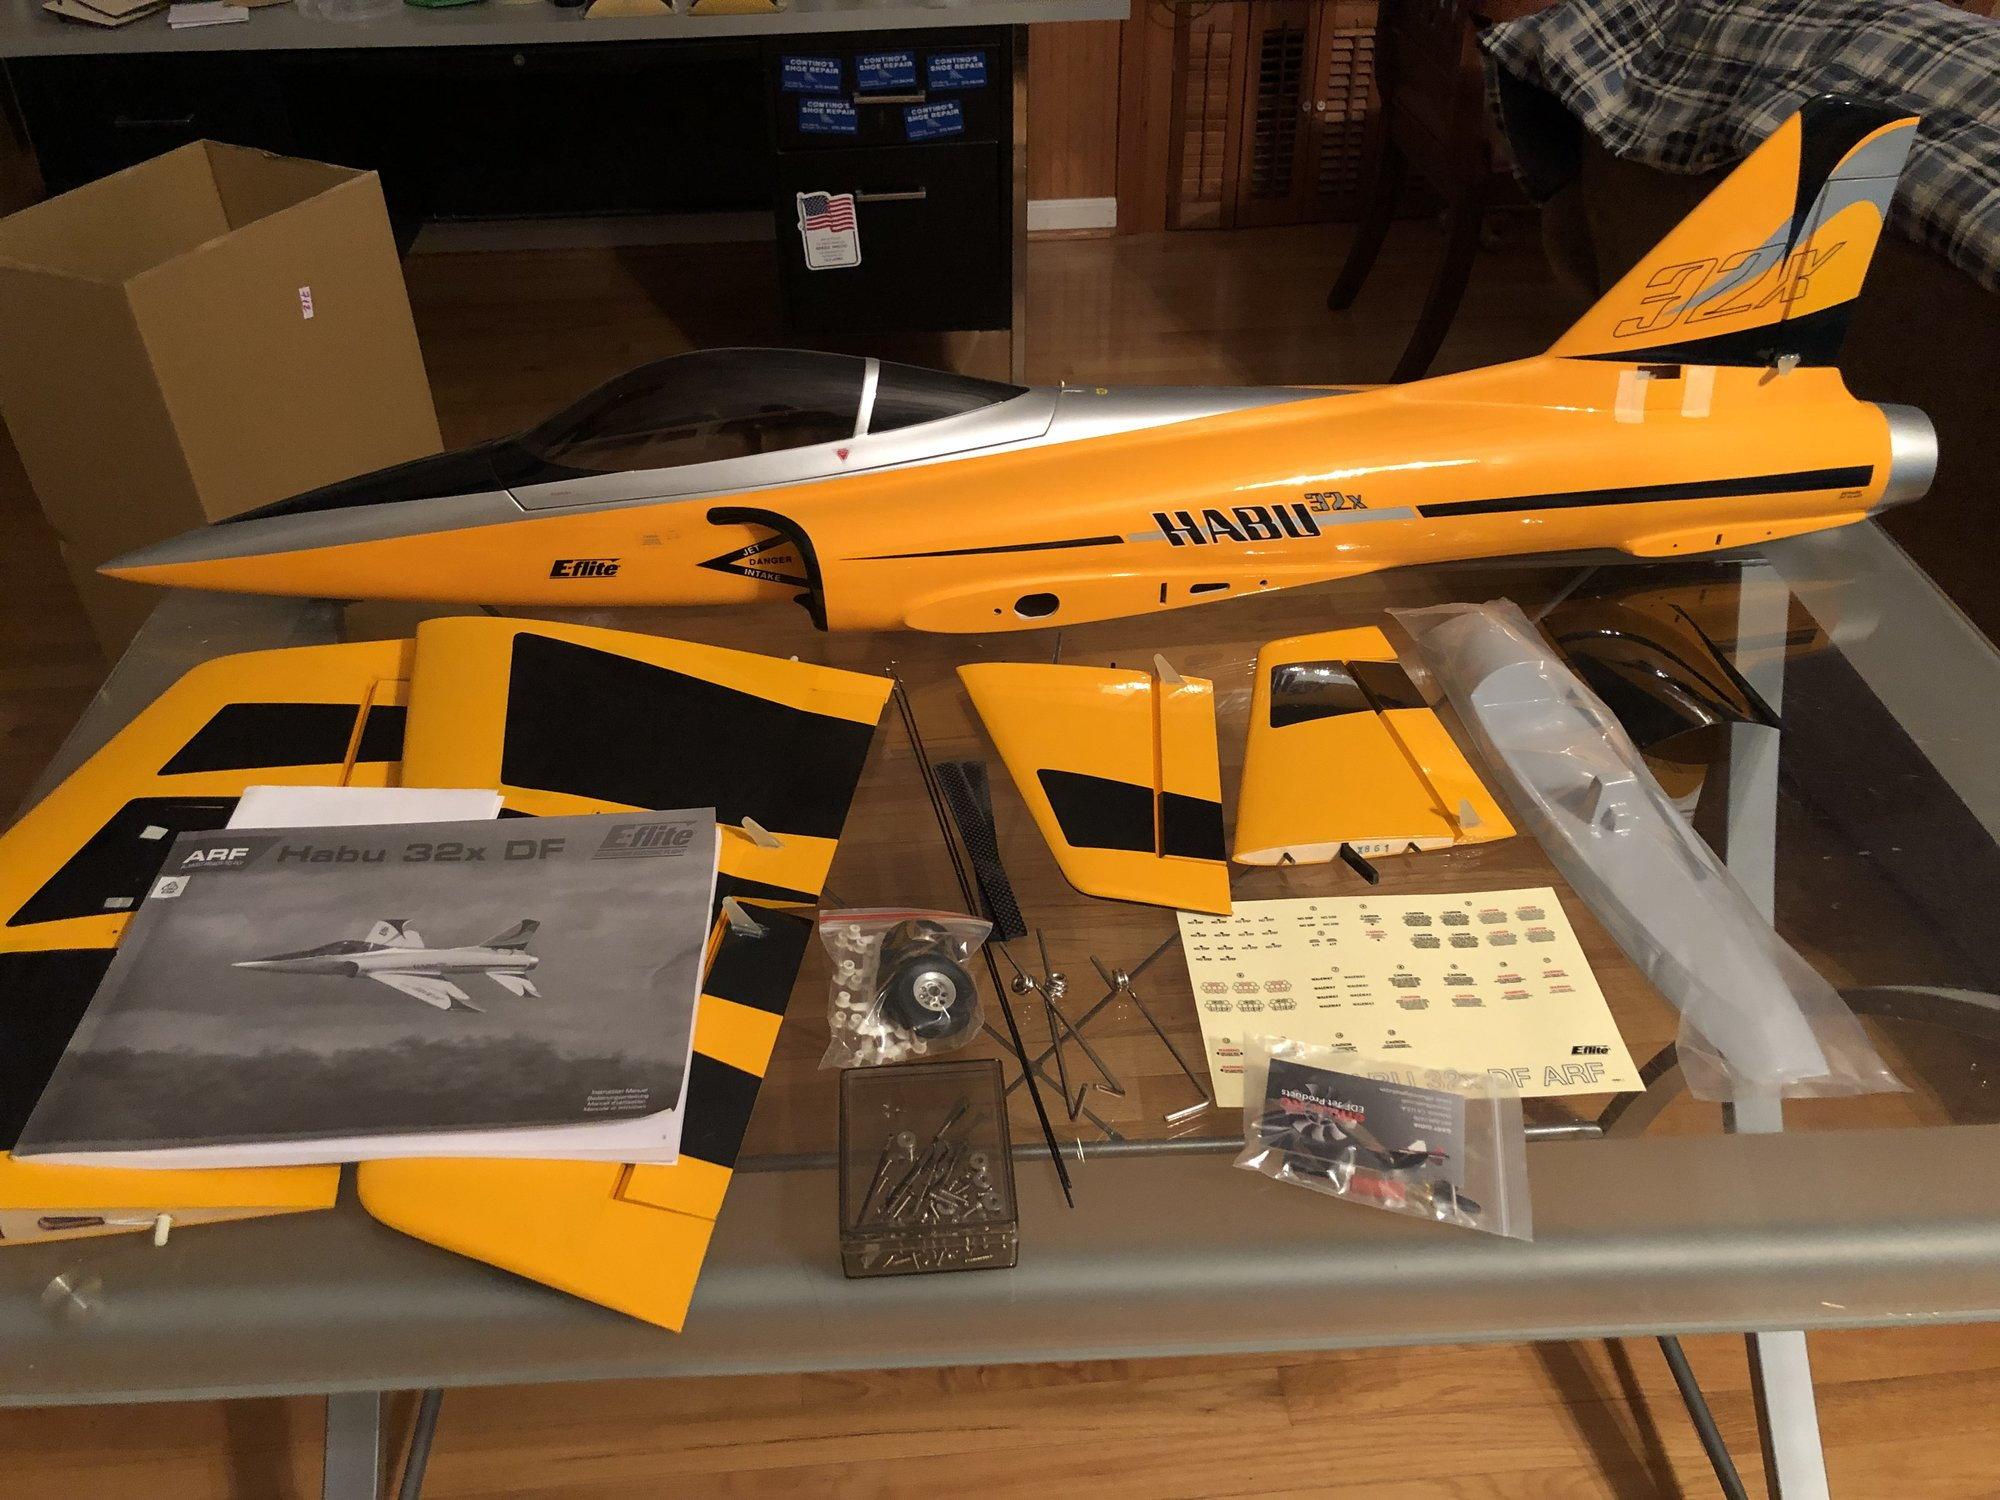 Habu 32 X/ with Retracts/Servos/Jet Fan EDF/ Shipped FREE to